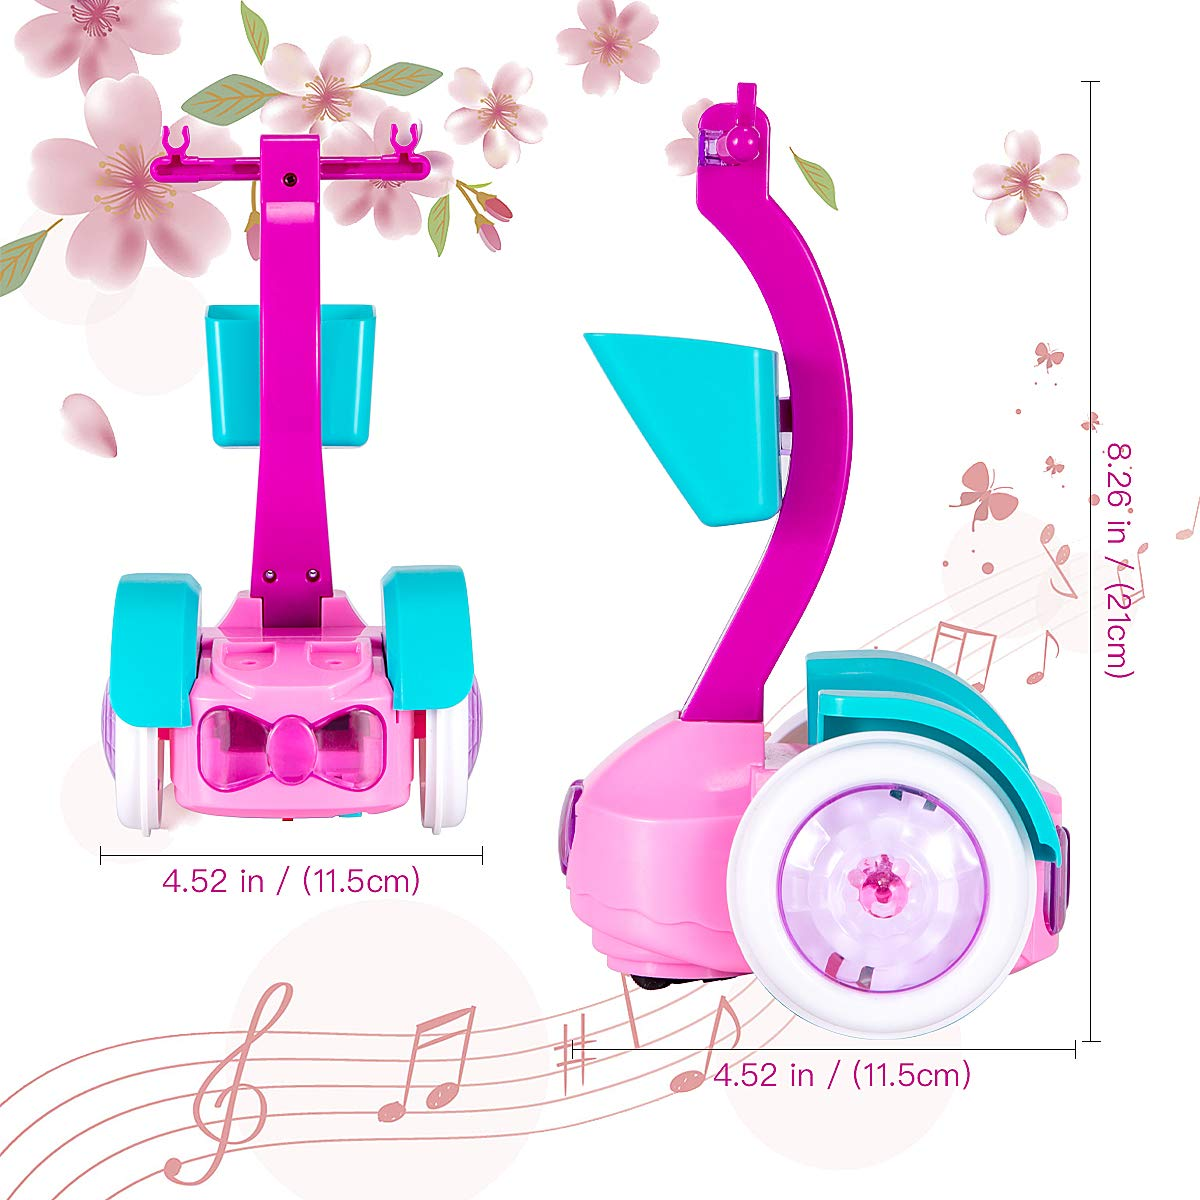 HiYuToy Doll and Glam Balance car